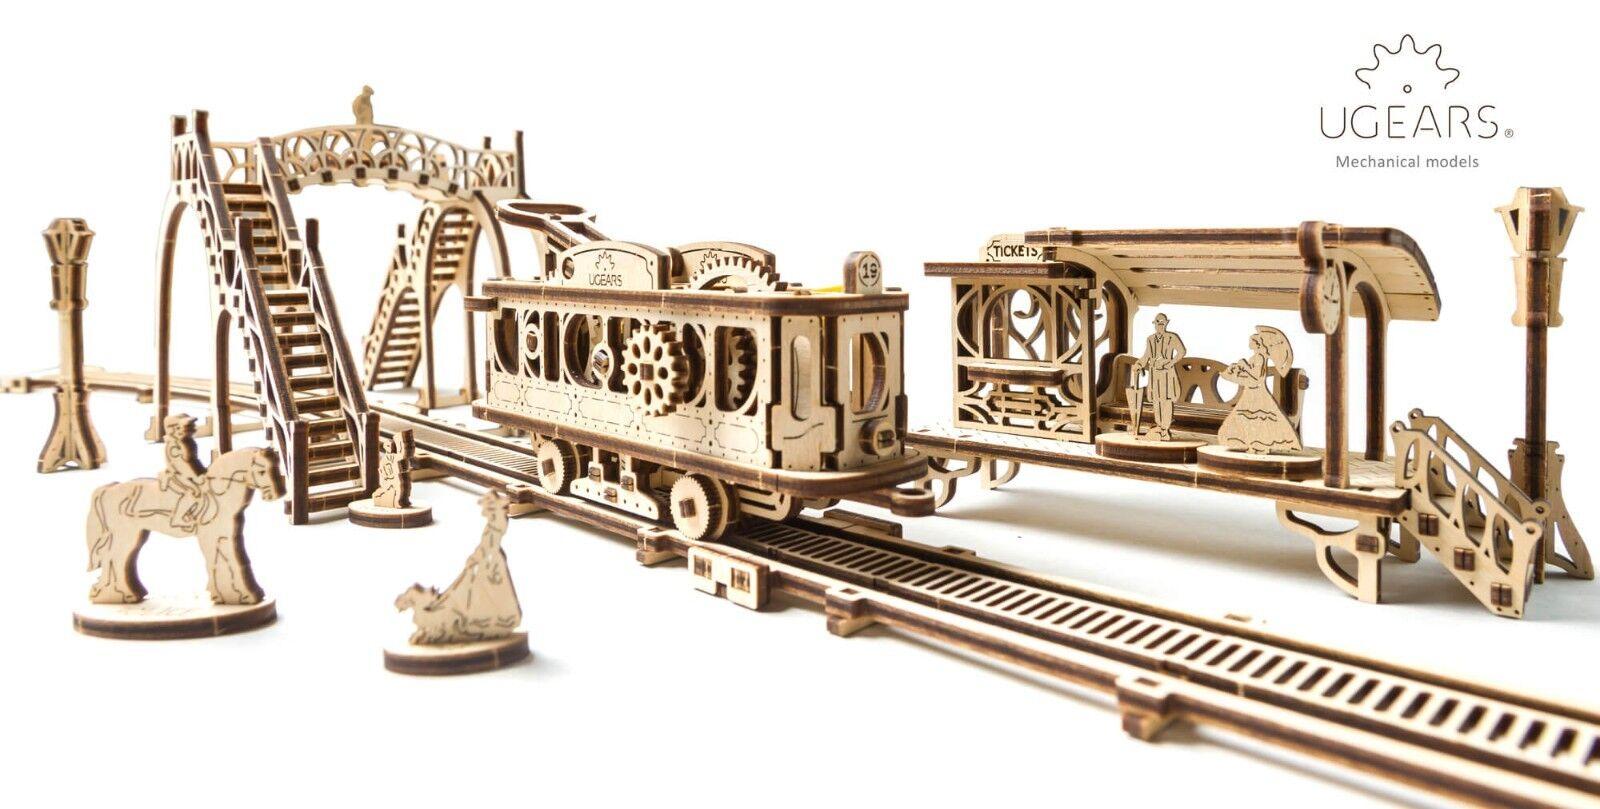 UGears Mechanical Town Series Tram Line mechanical wooden model KIT 3D puzzle